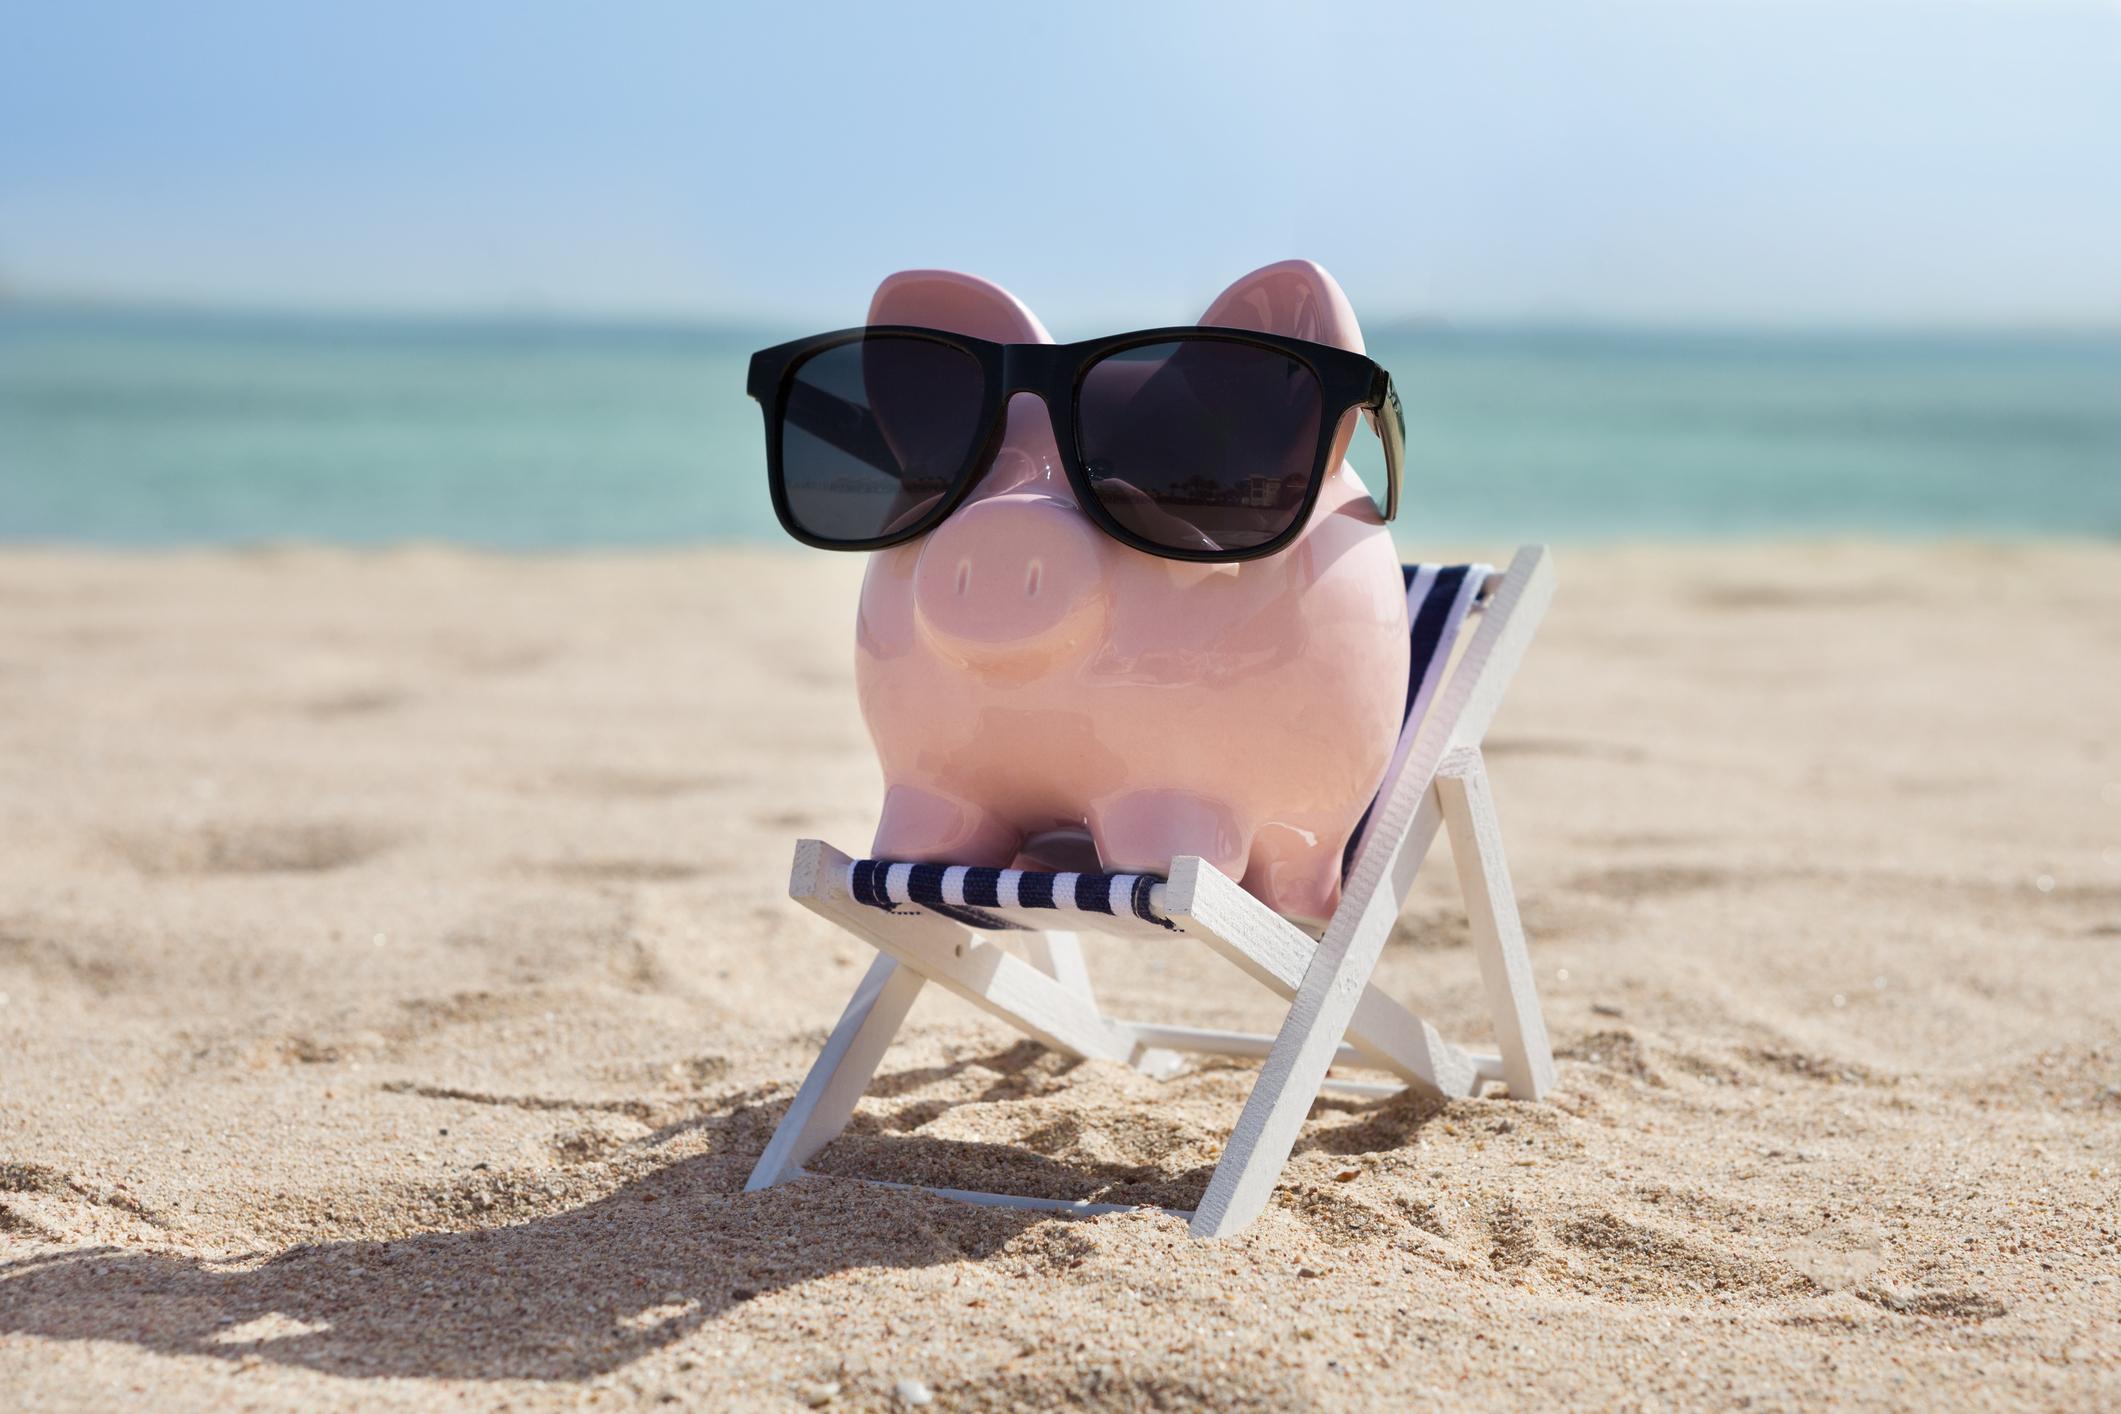 a piggy bank wears sunglasses on a little chair on a beach.